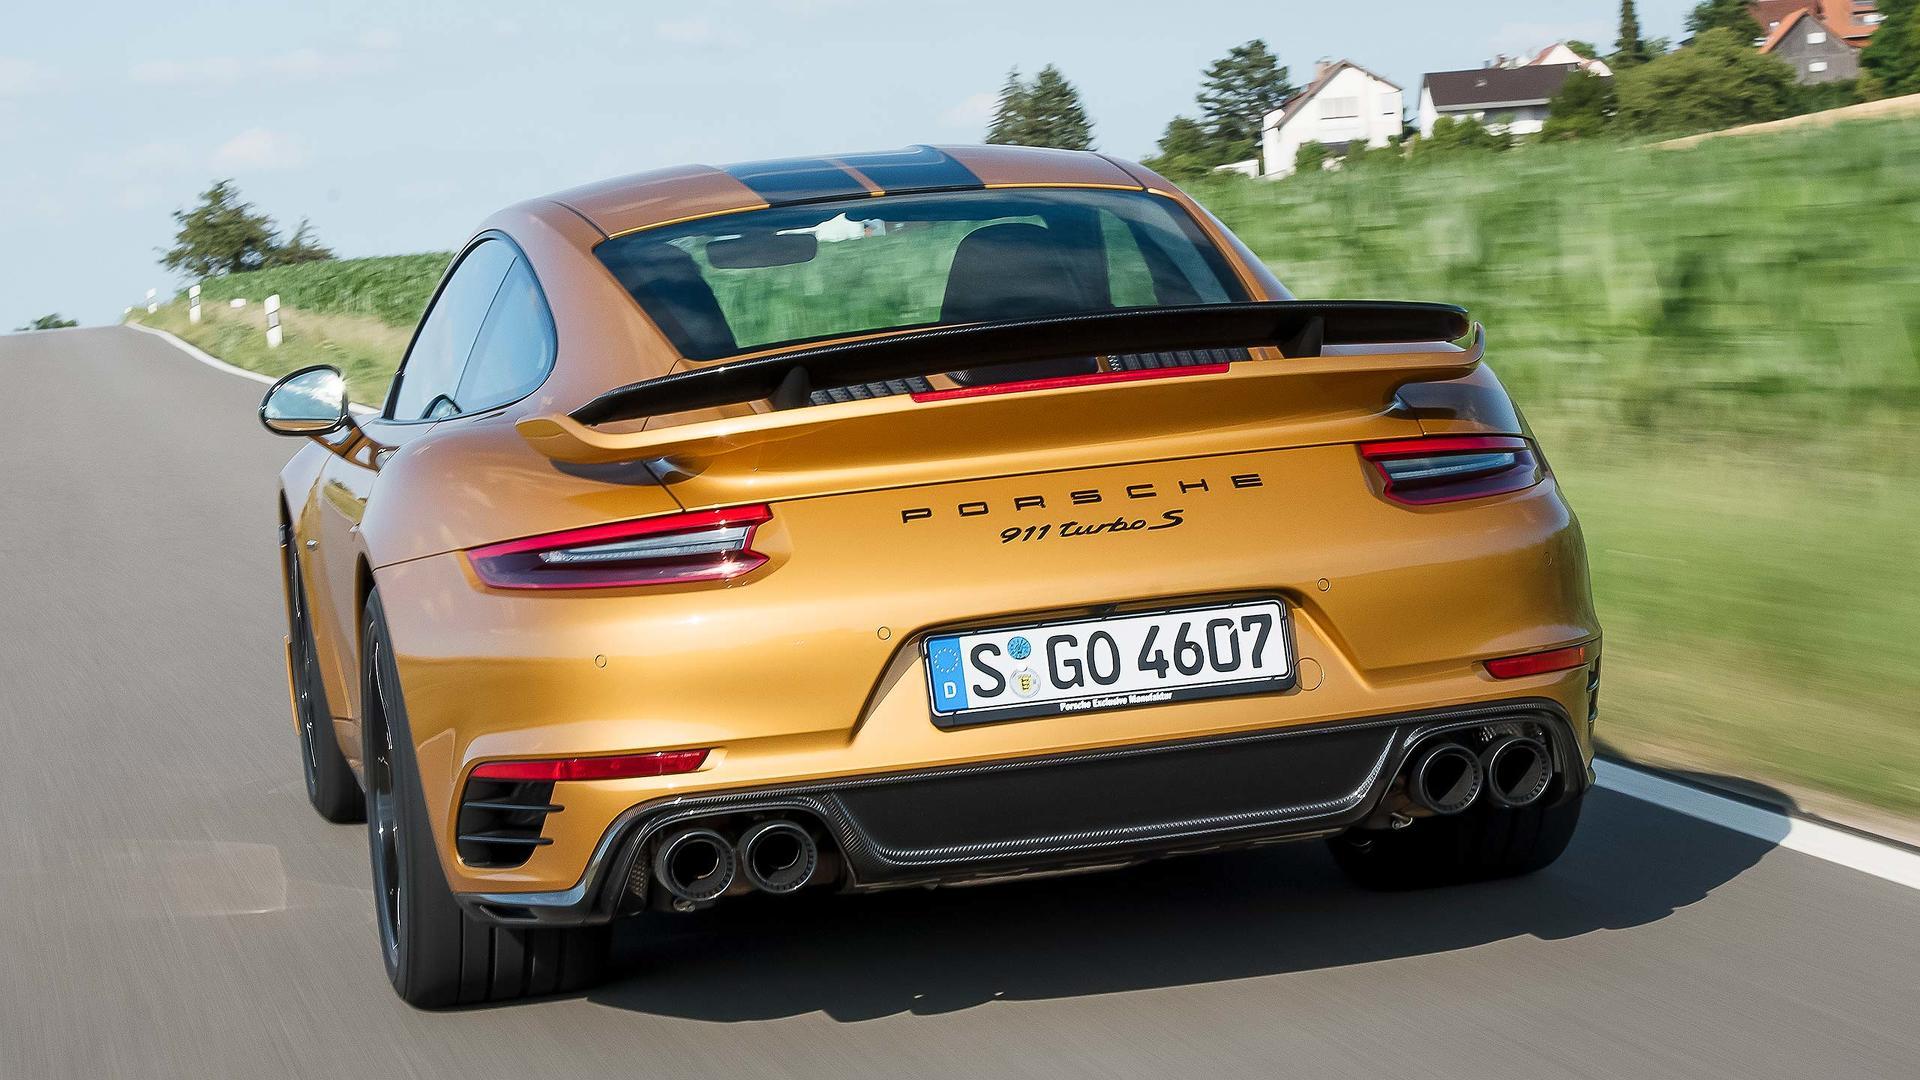 2017 porsche 911 turbo s exclusive